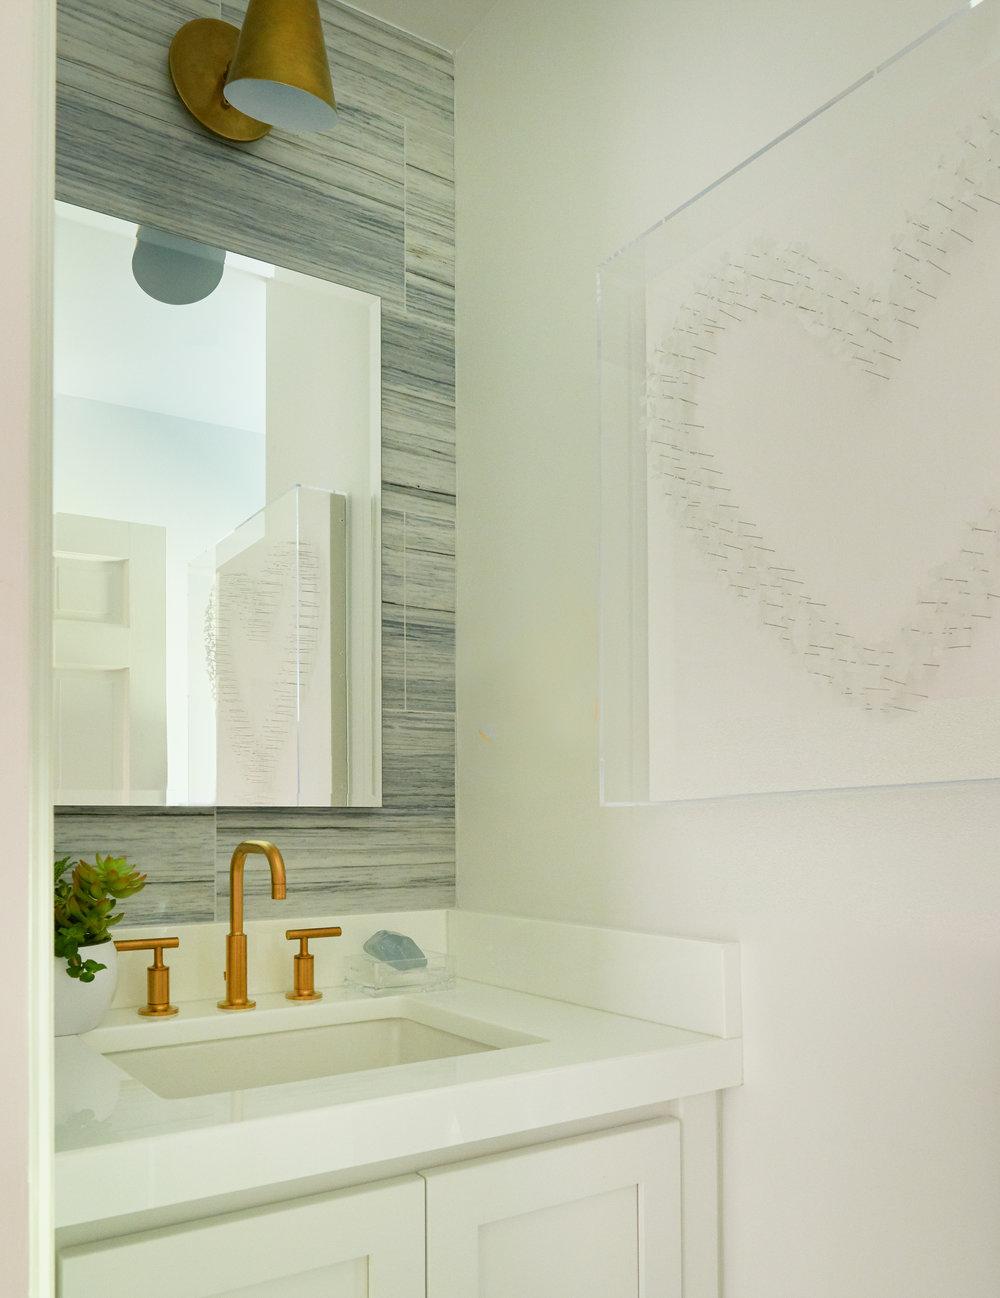 Bathroom details - wallpaper